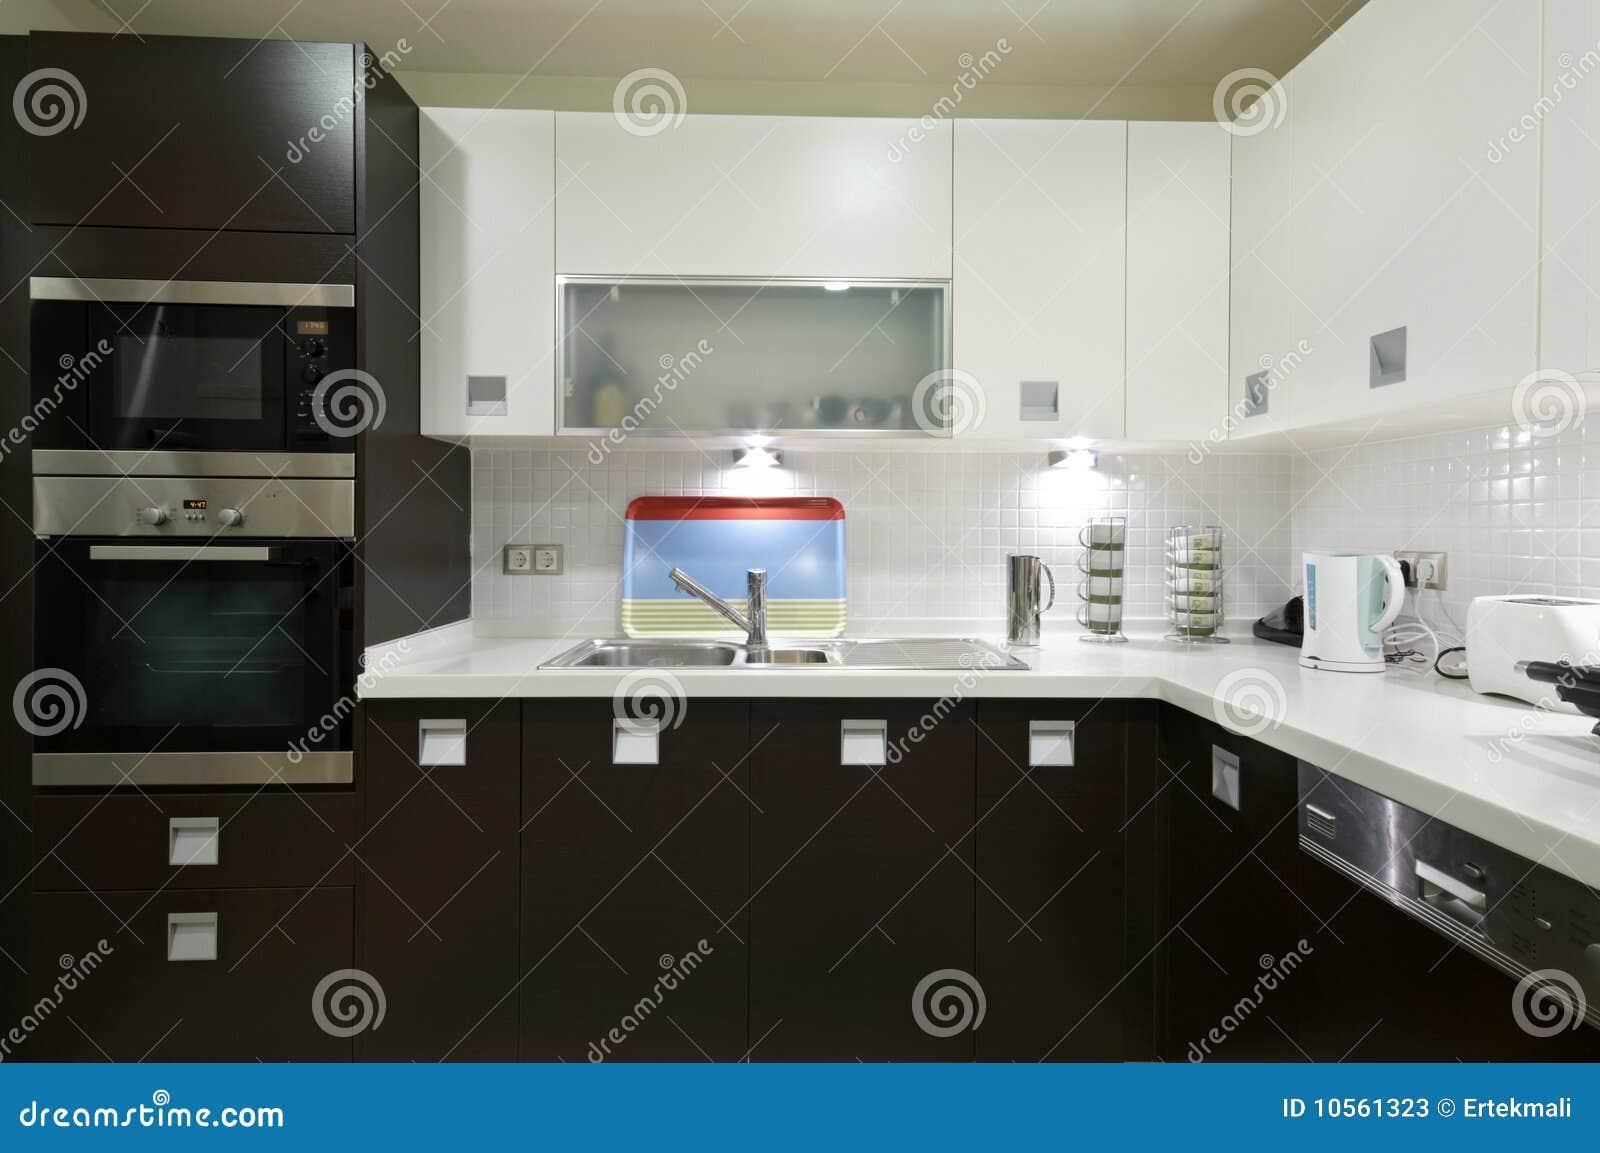 Sleek Modern Kitchen Stock Image Image Of Microwave 10561323